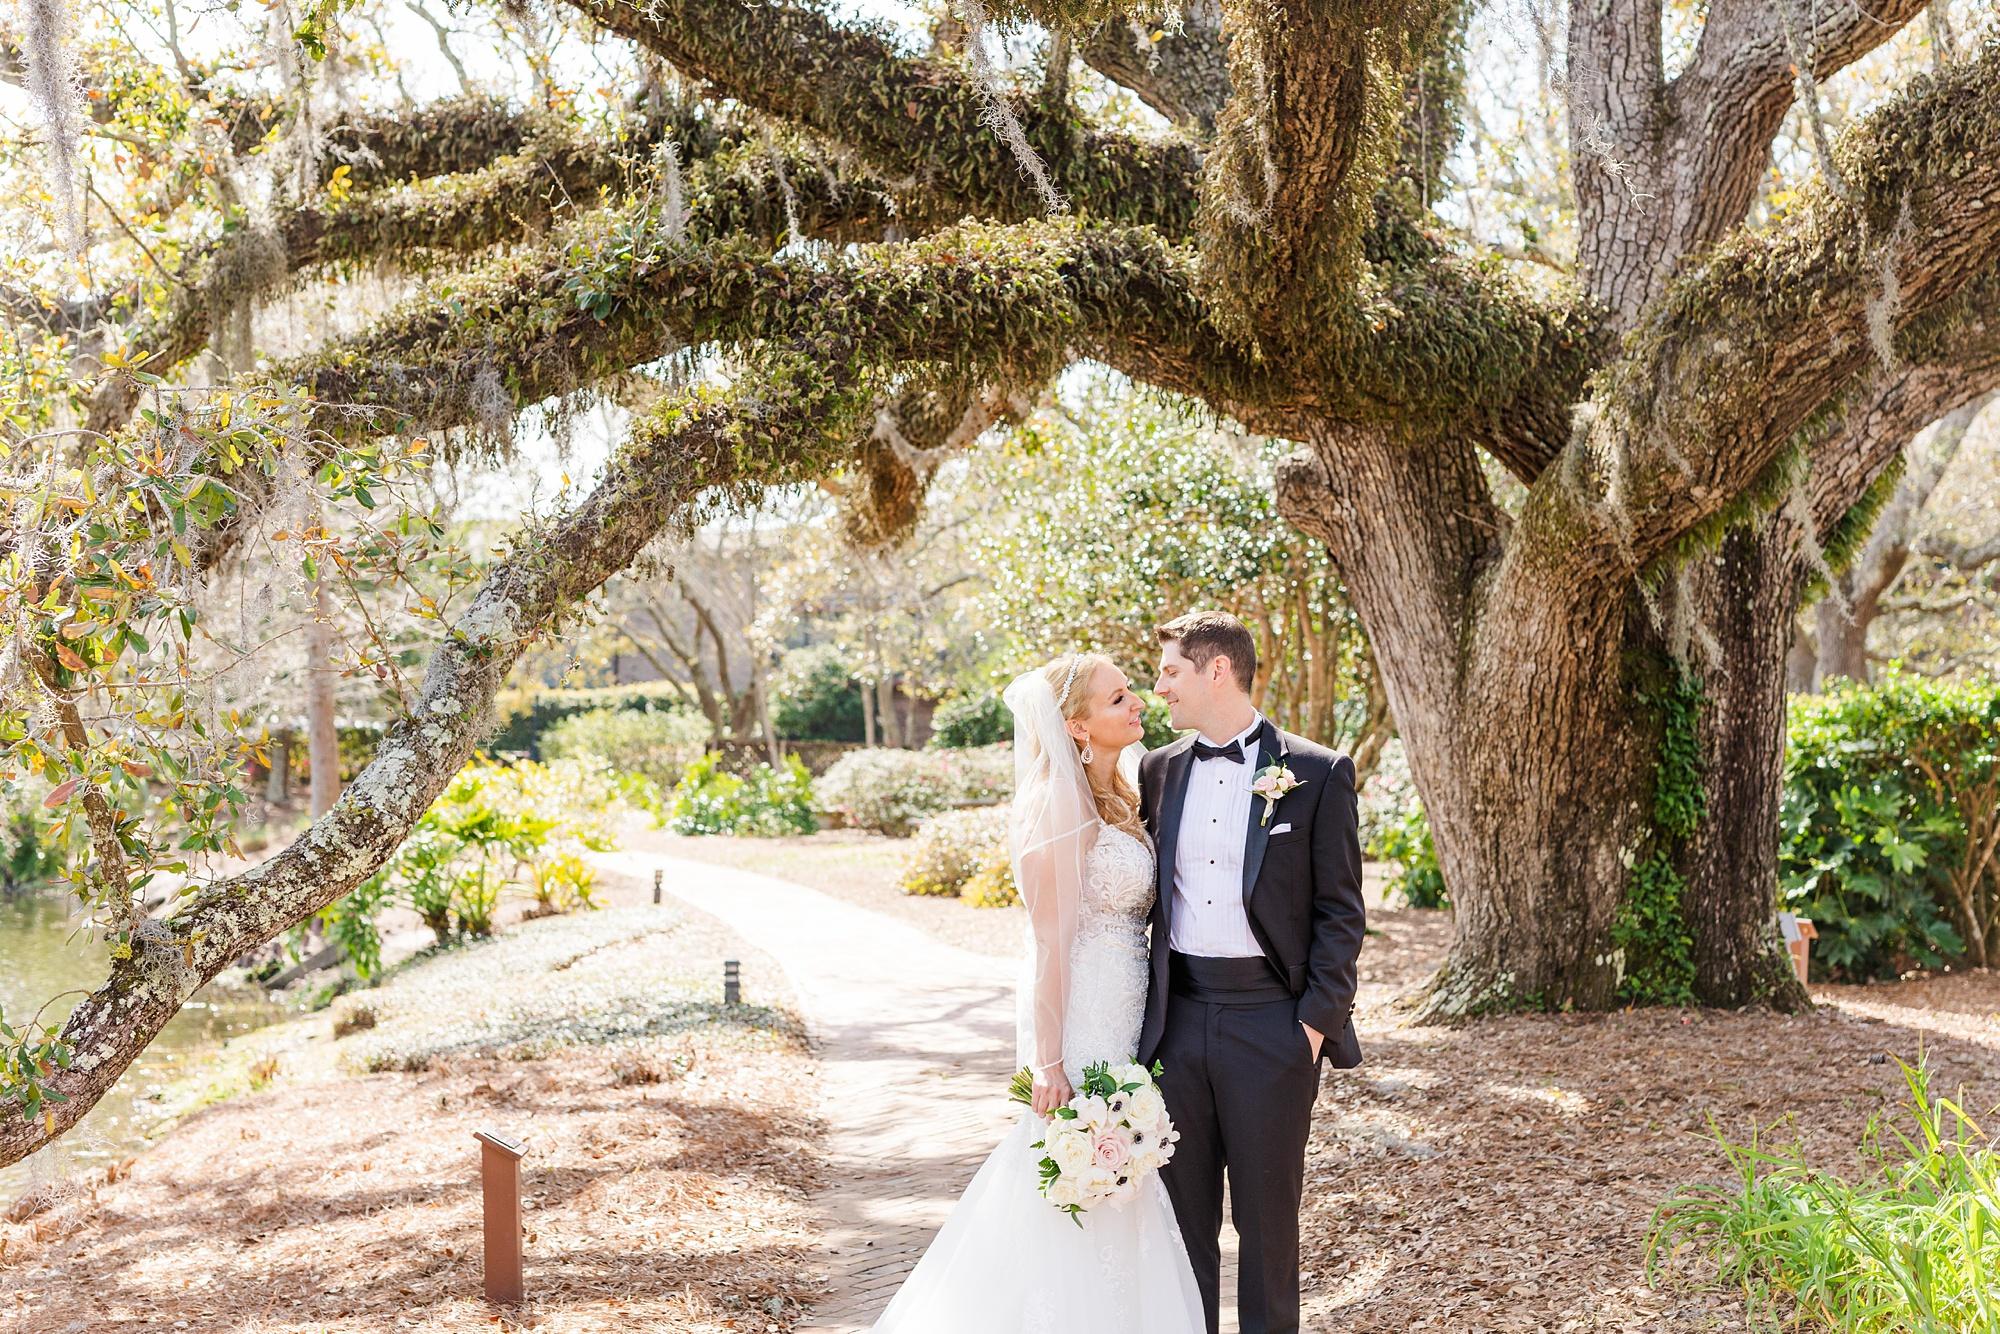 Alabama wedding portraits under tree with Spanish moss